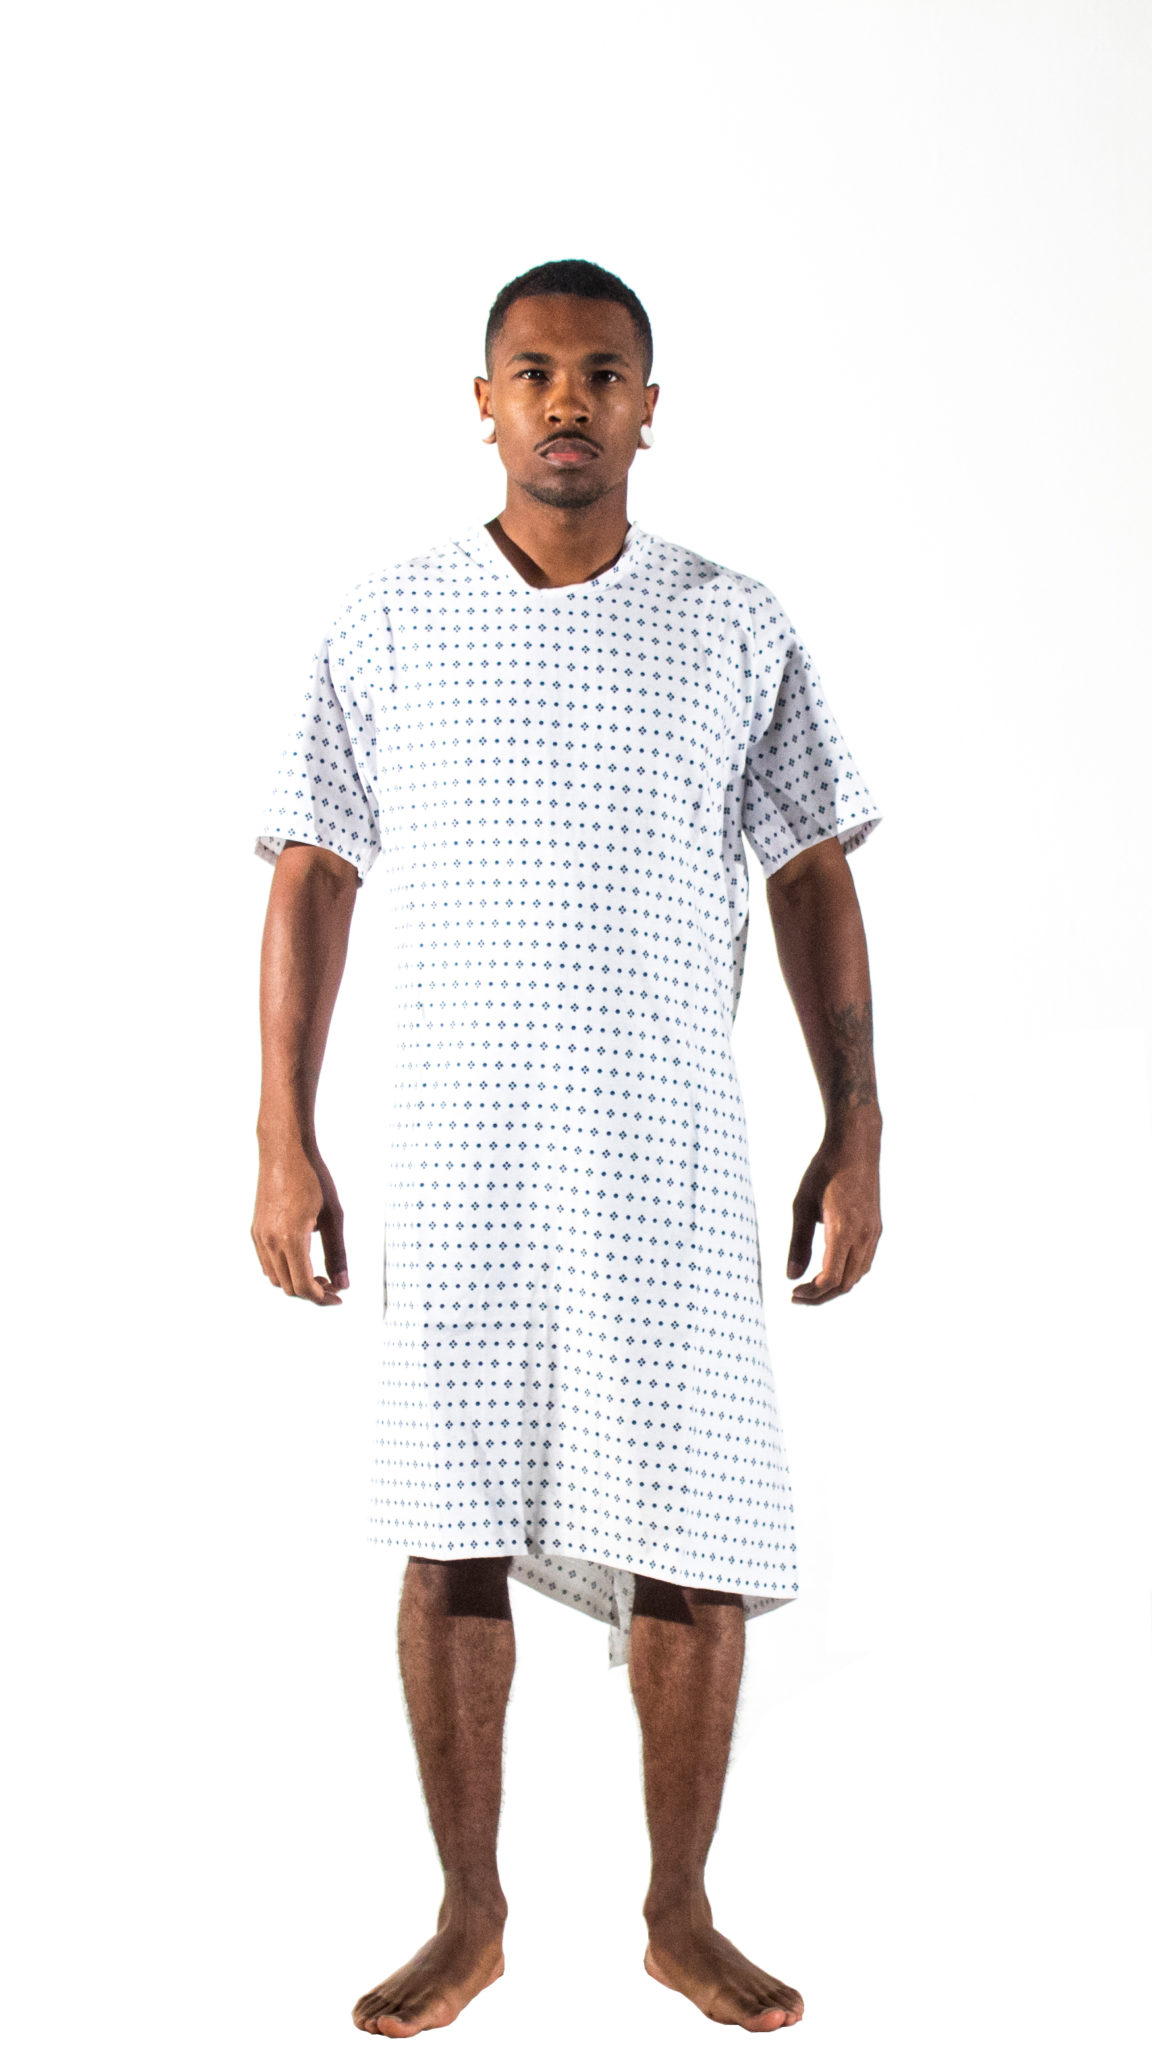 Hospital Costume Rentals